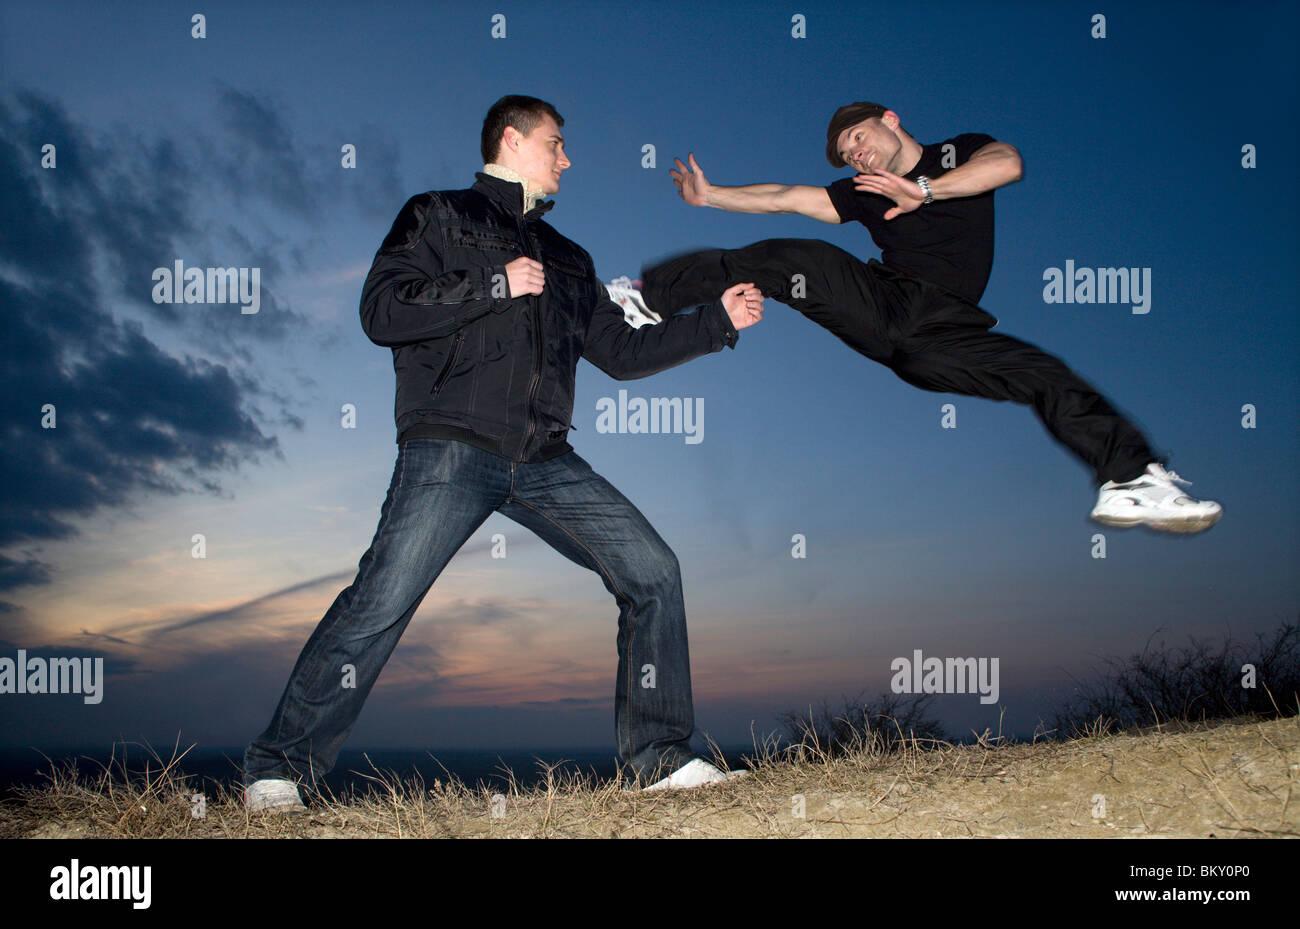 karate training by sunset - Stock Image